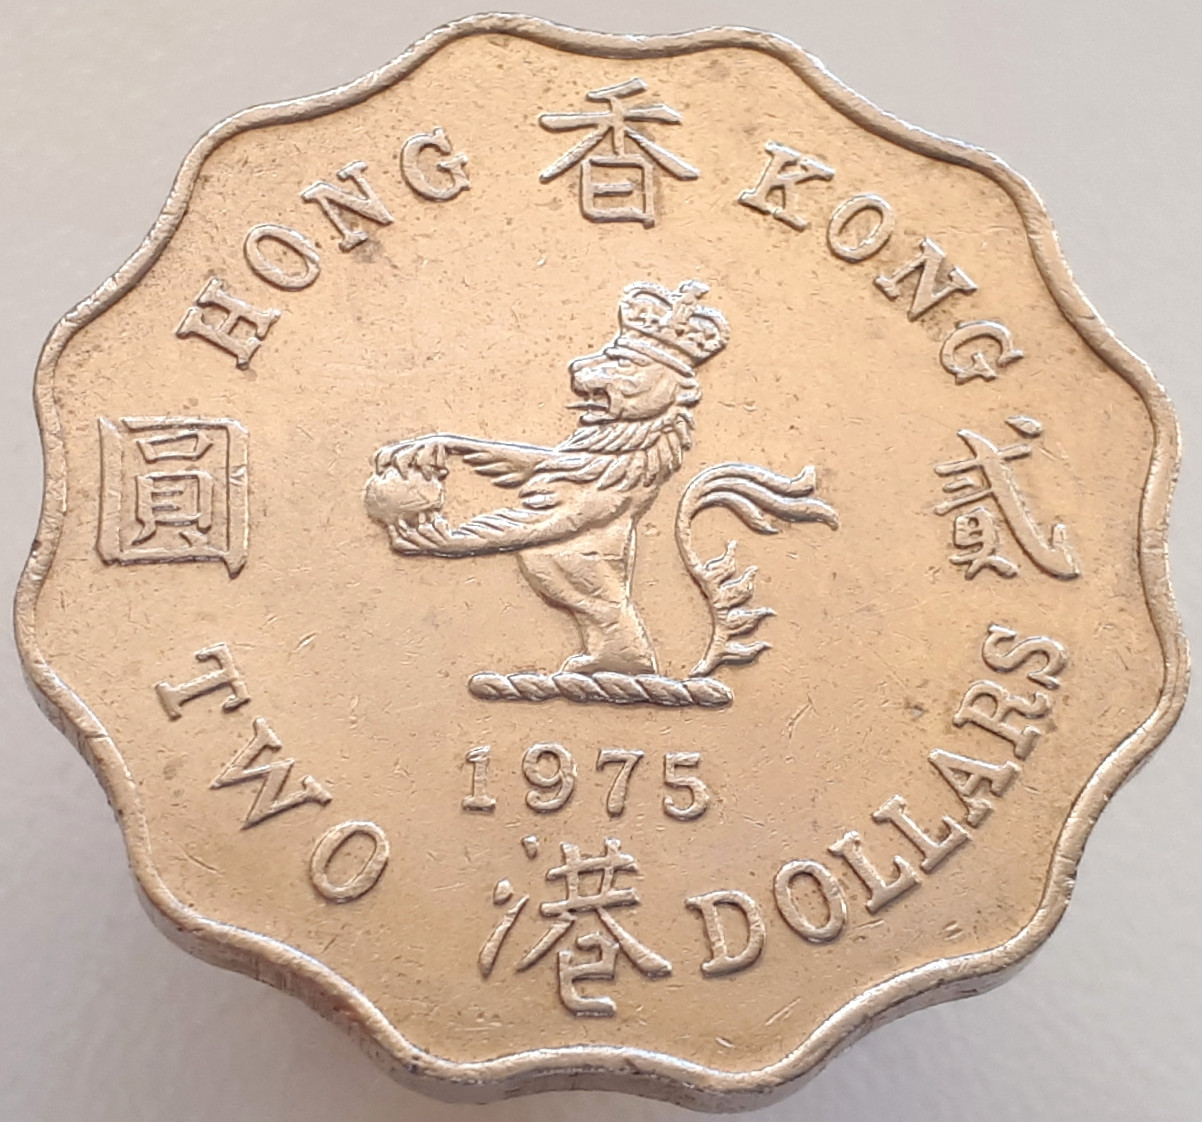 Гонконг 2 доллара 1975